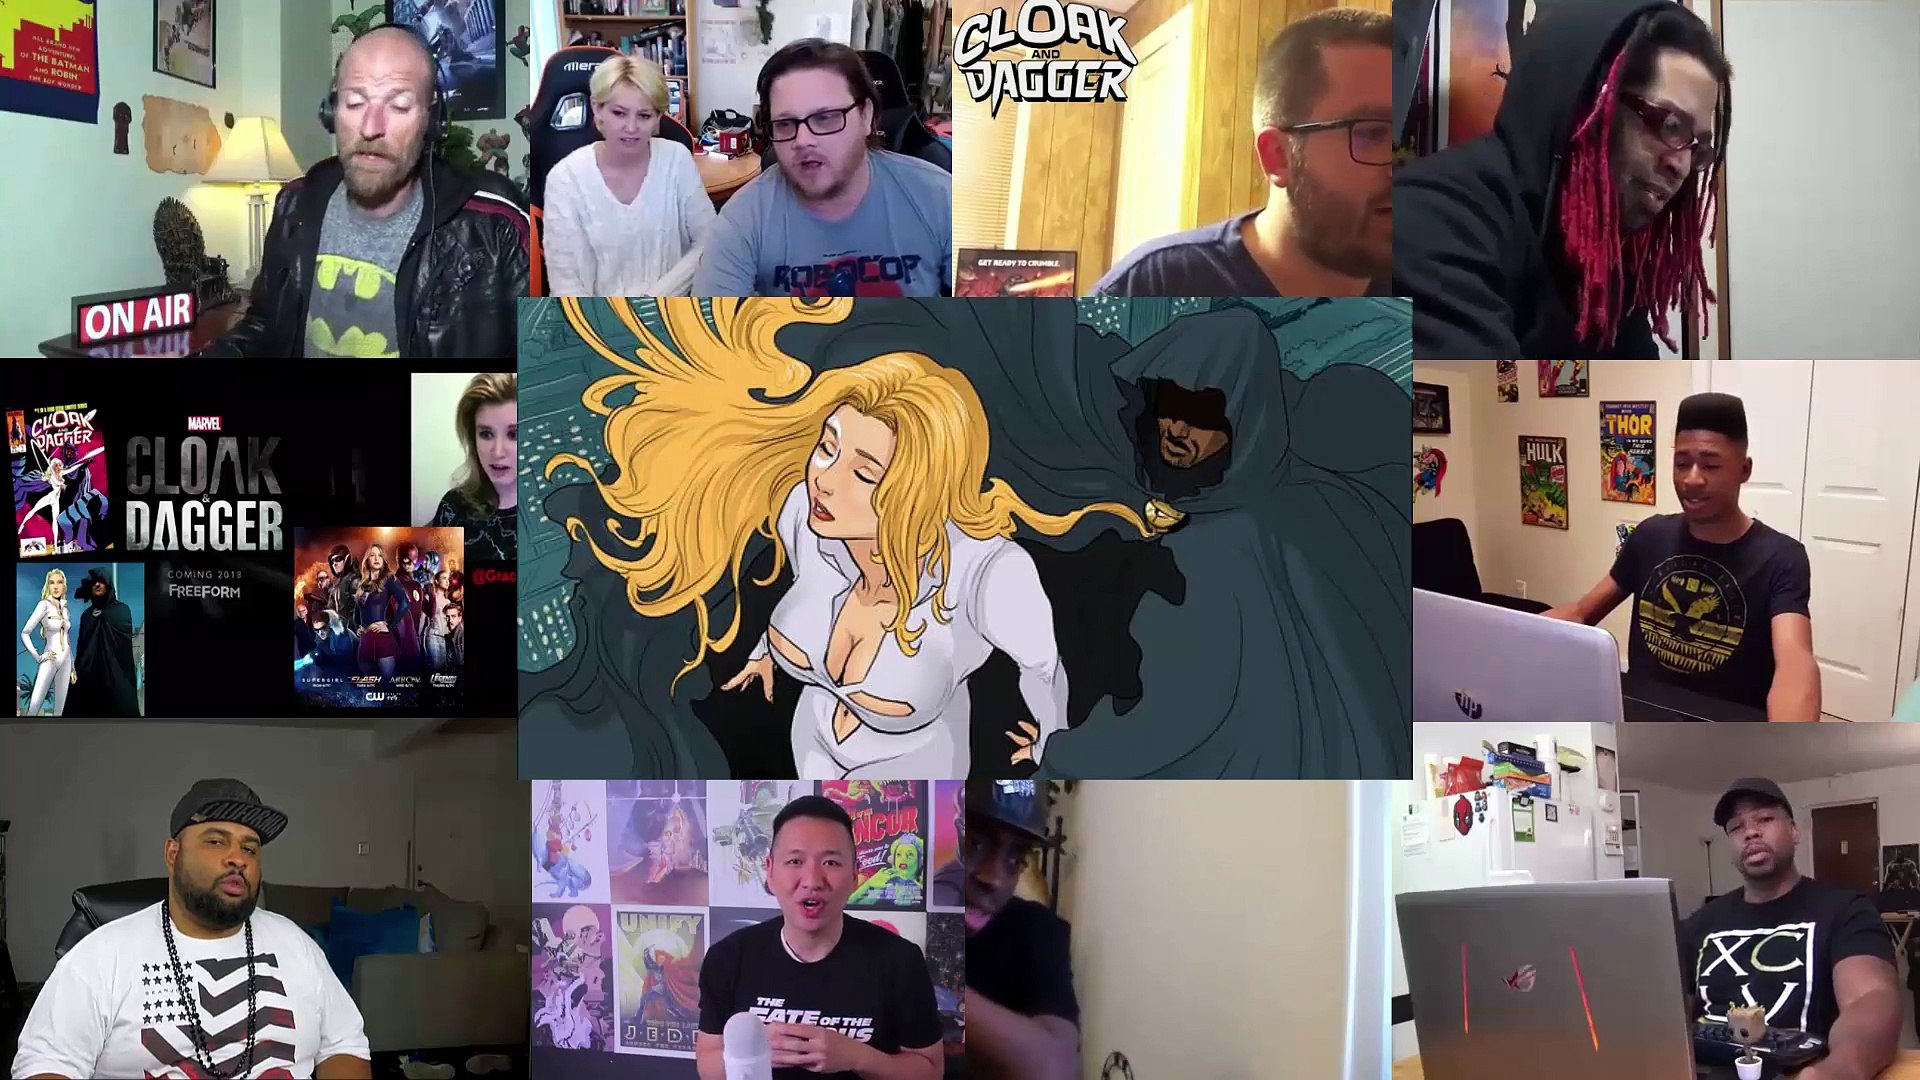 Cloak and Dagger - Marvel - Official Trailer - Reaction Mashup, Cloak and Dagger - Marvel - Official